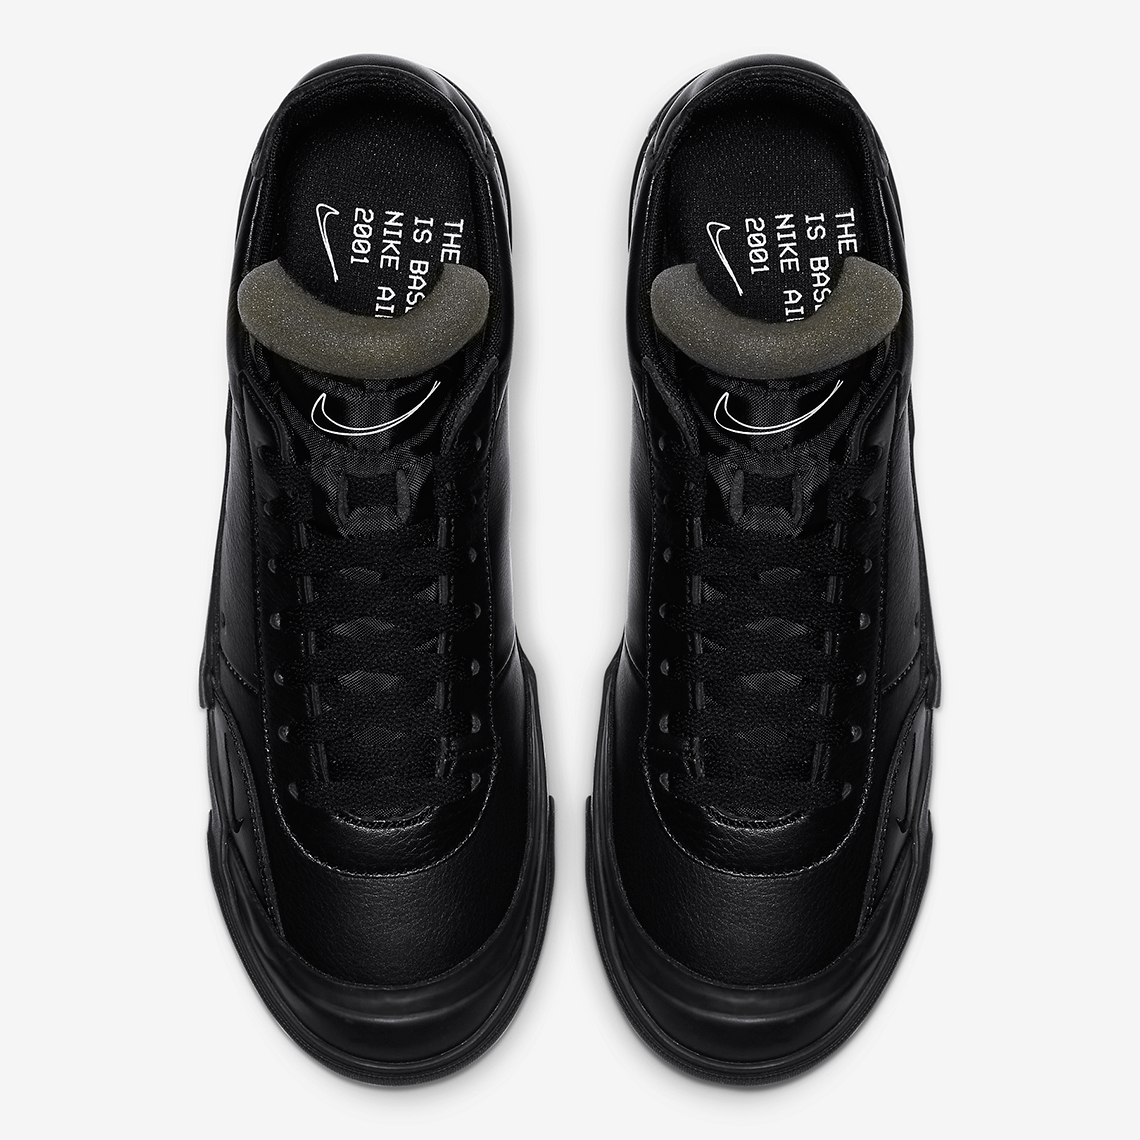 Qualité supérieure 8b6fe 5aafc Nike Drop Type LX Triple Black CN6916-001   SneakerNews.com